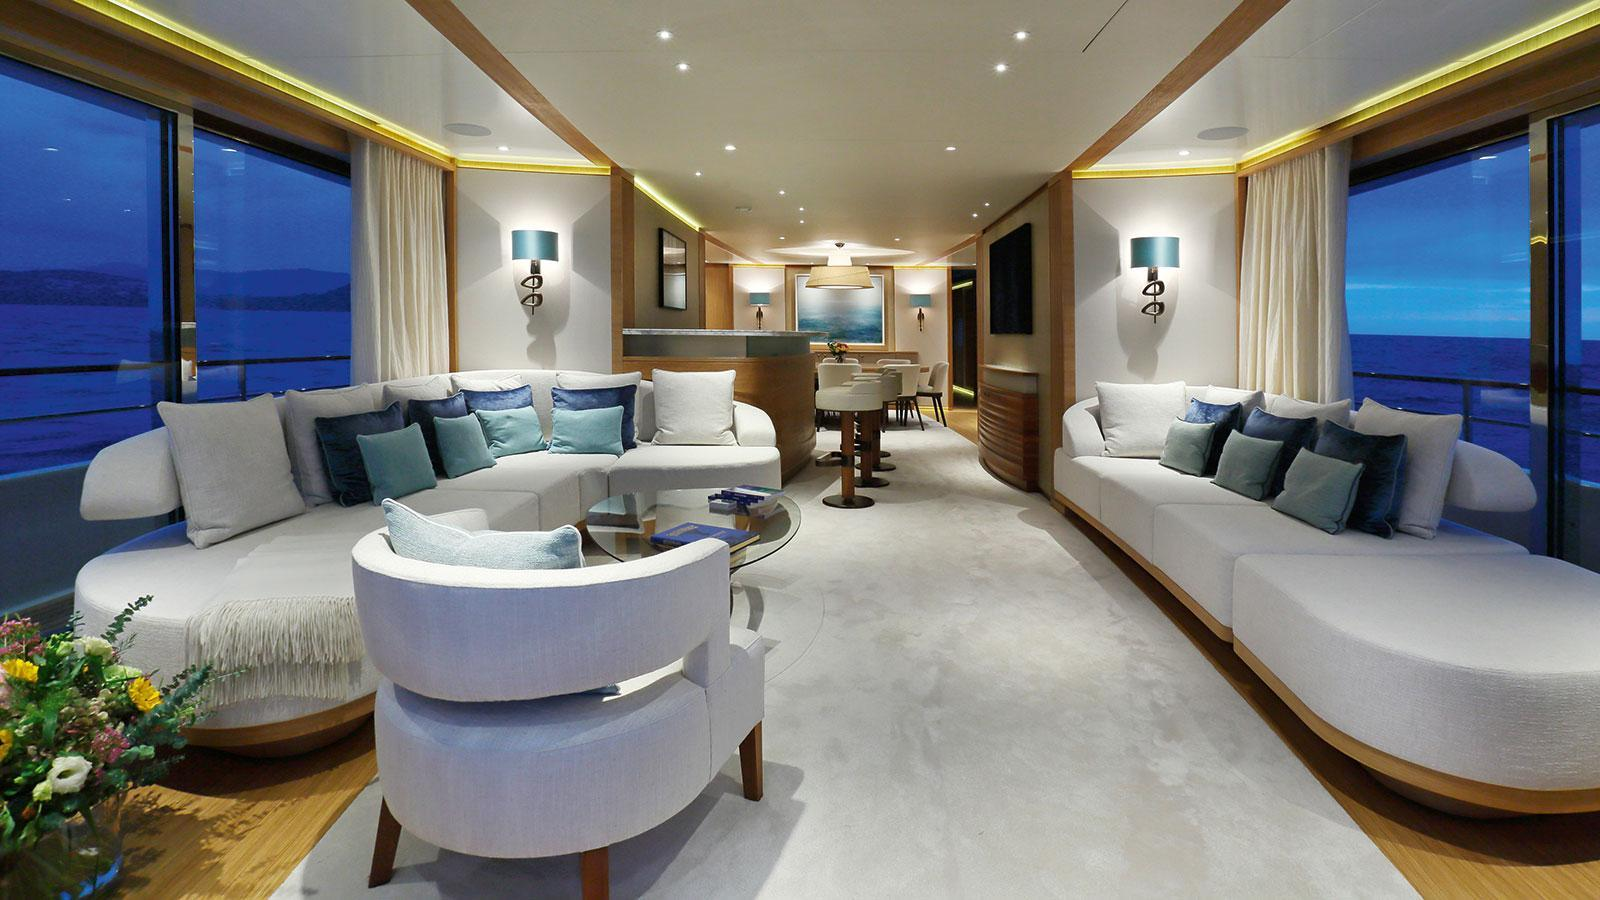 solis-motor-yacht-mulder-2015-34m-saloon